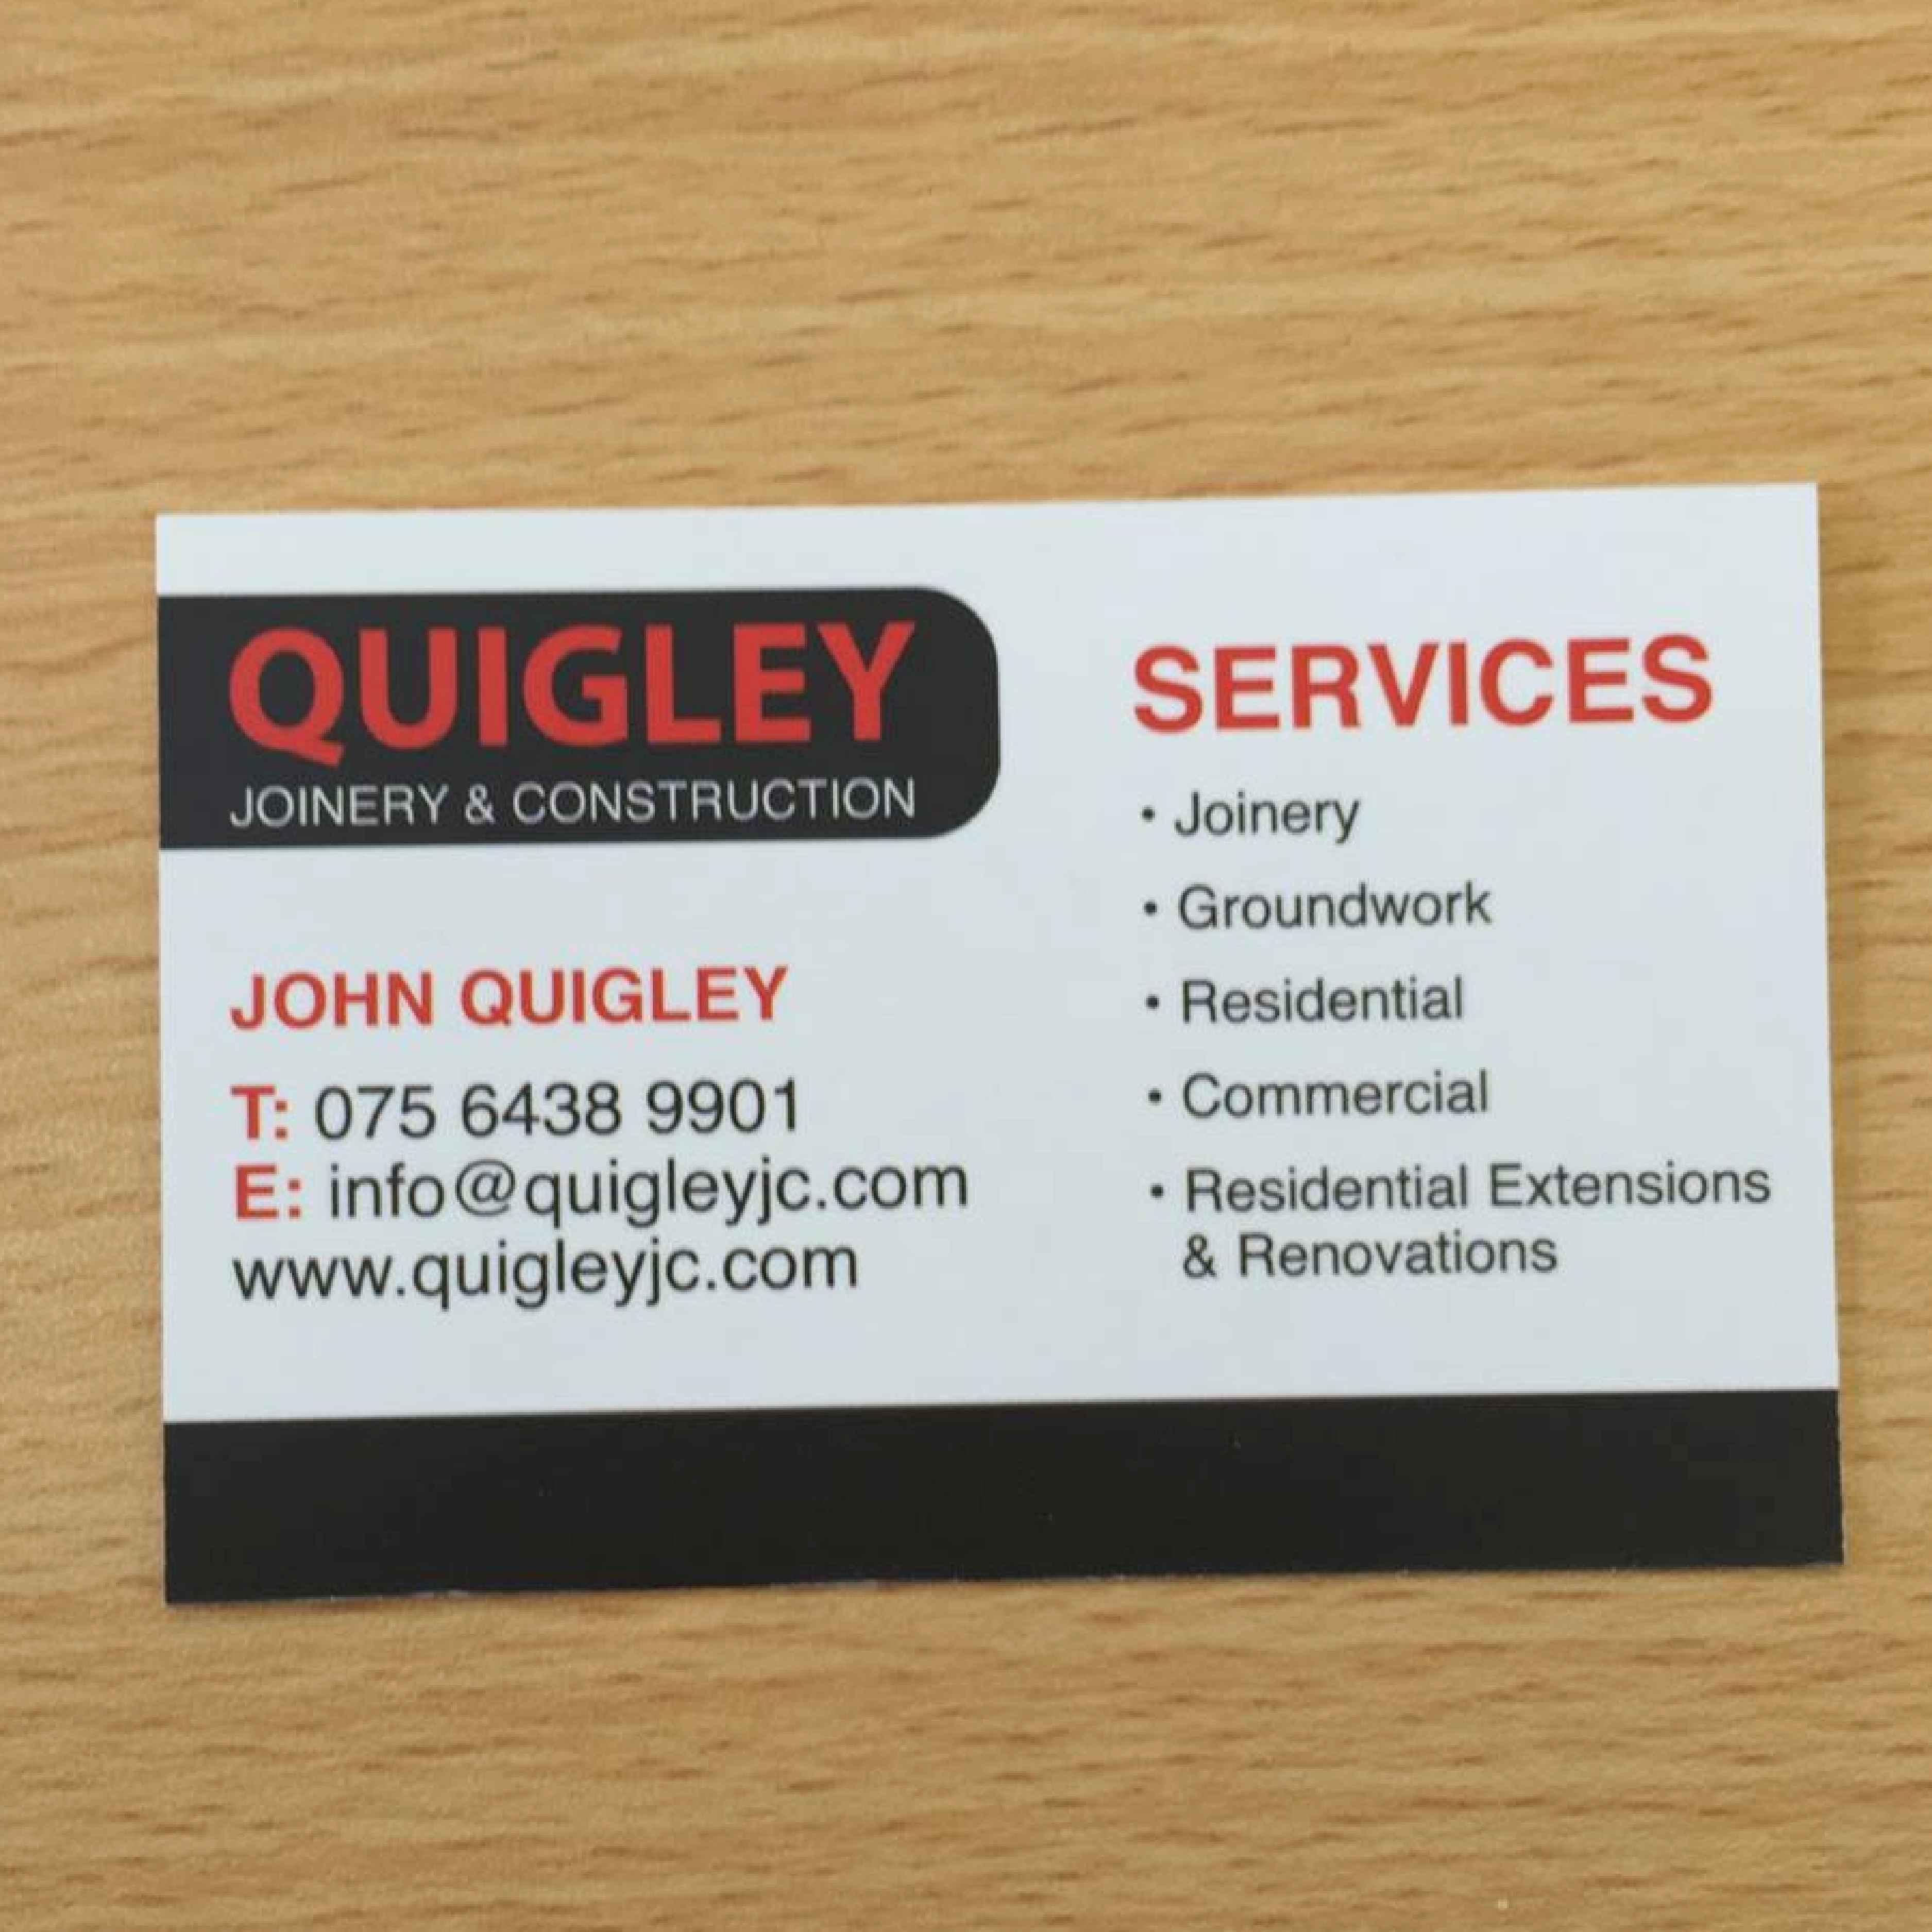 Business cards 02 web design graphic design logo design derry business cards 02 colourmoves